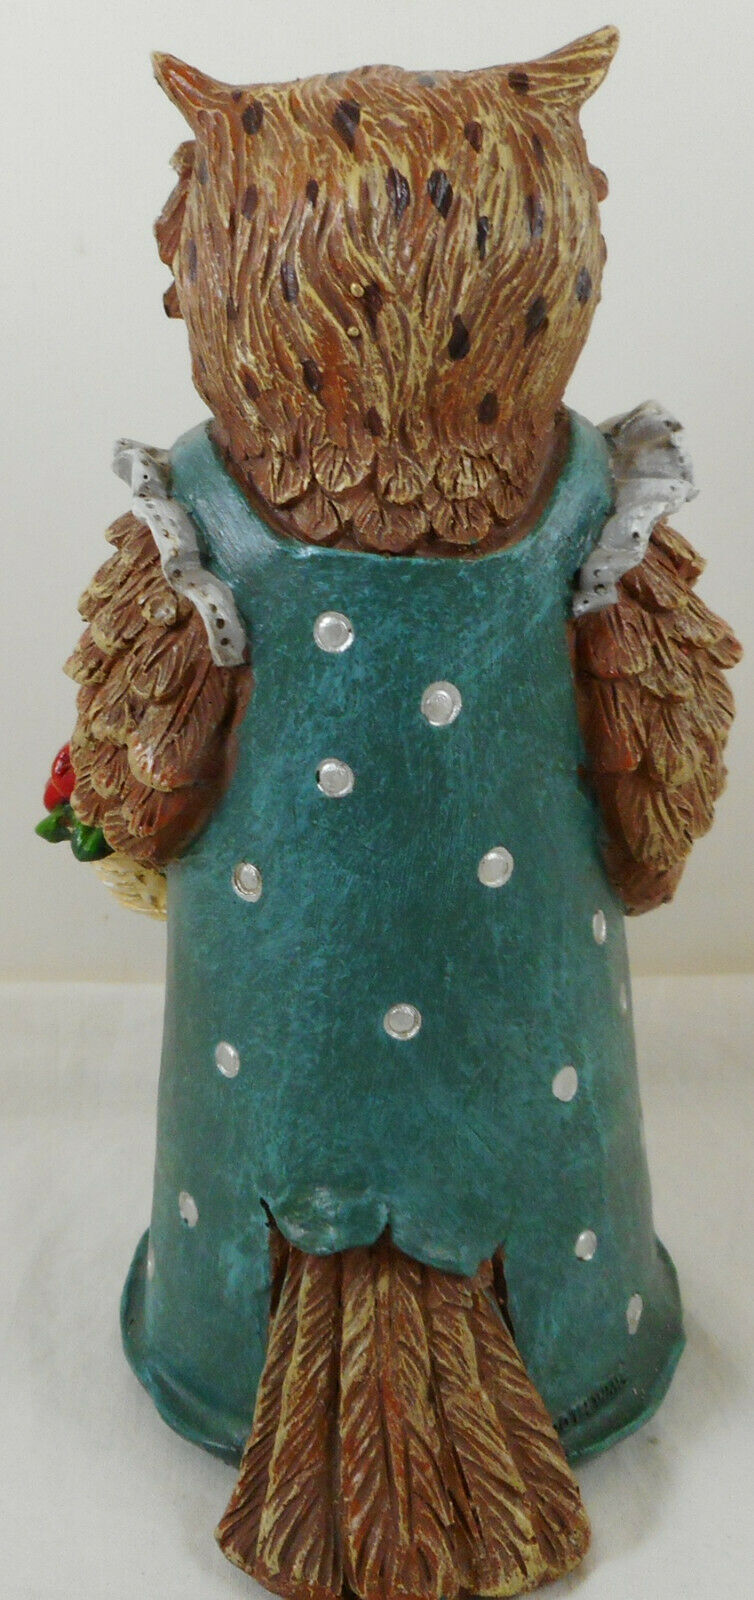 "Anthropomorphic Owl Figurine 9"" Resin Green Dress image 3"